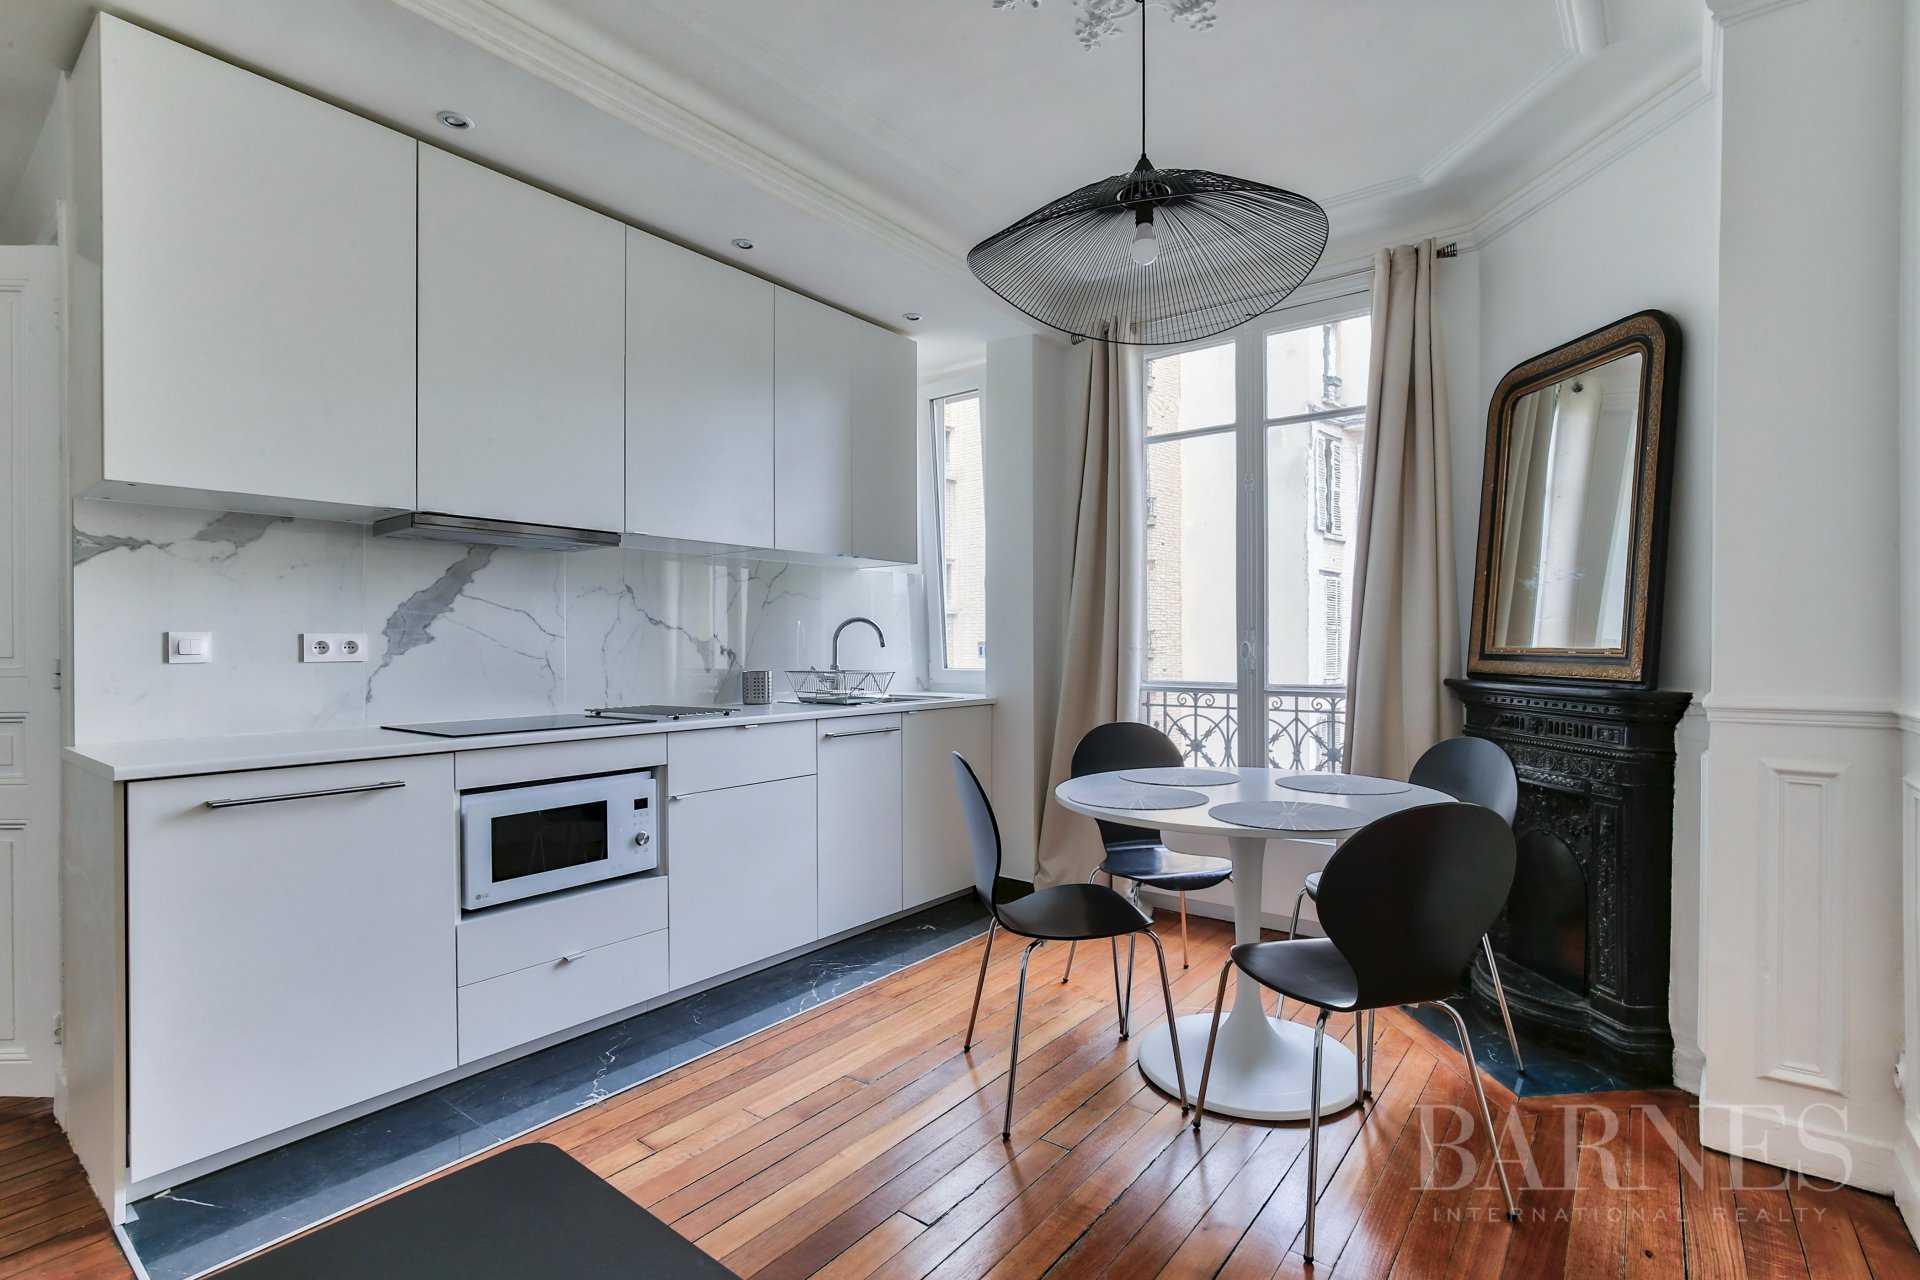 APARTAMENTO, Boulogne-Billancourt - Ref 3124215